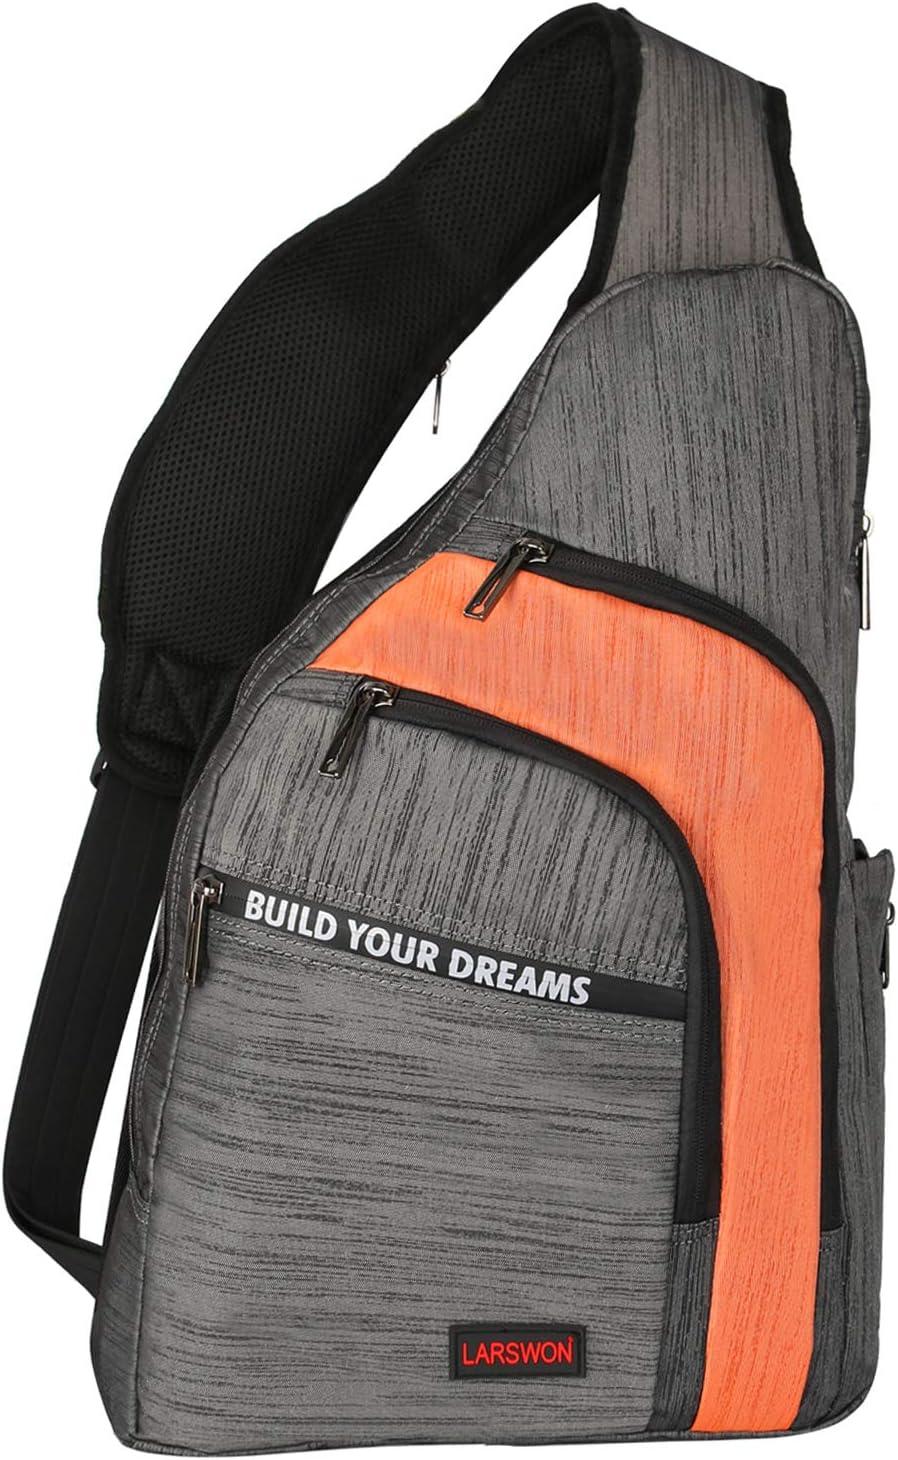 Larswon Sling Backpacks, Sling Bag for Laptop, Crossbody Bags Shoulder Bag Gray